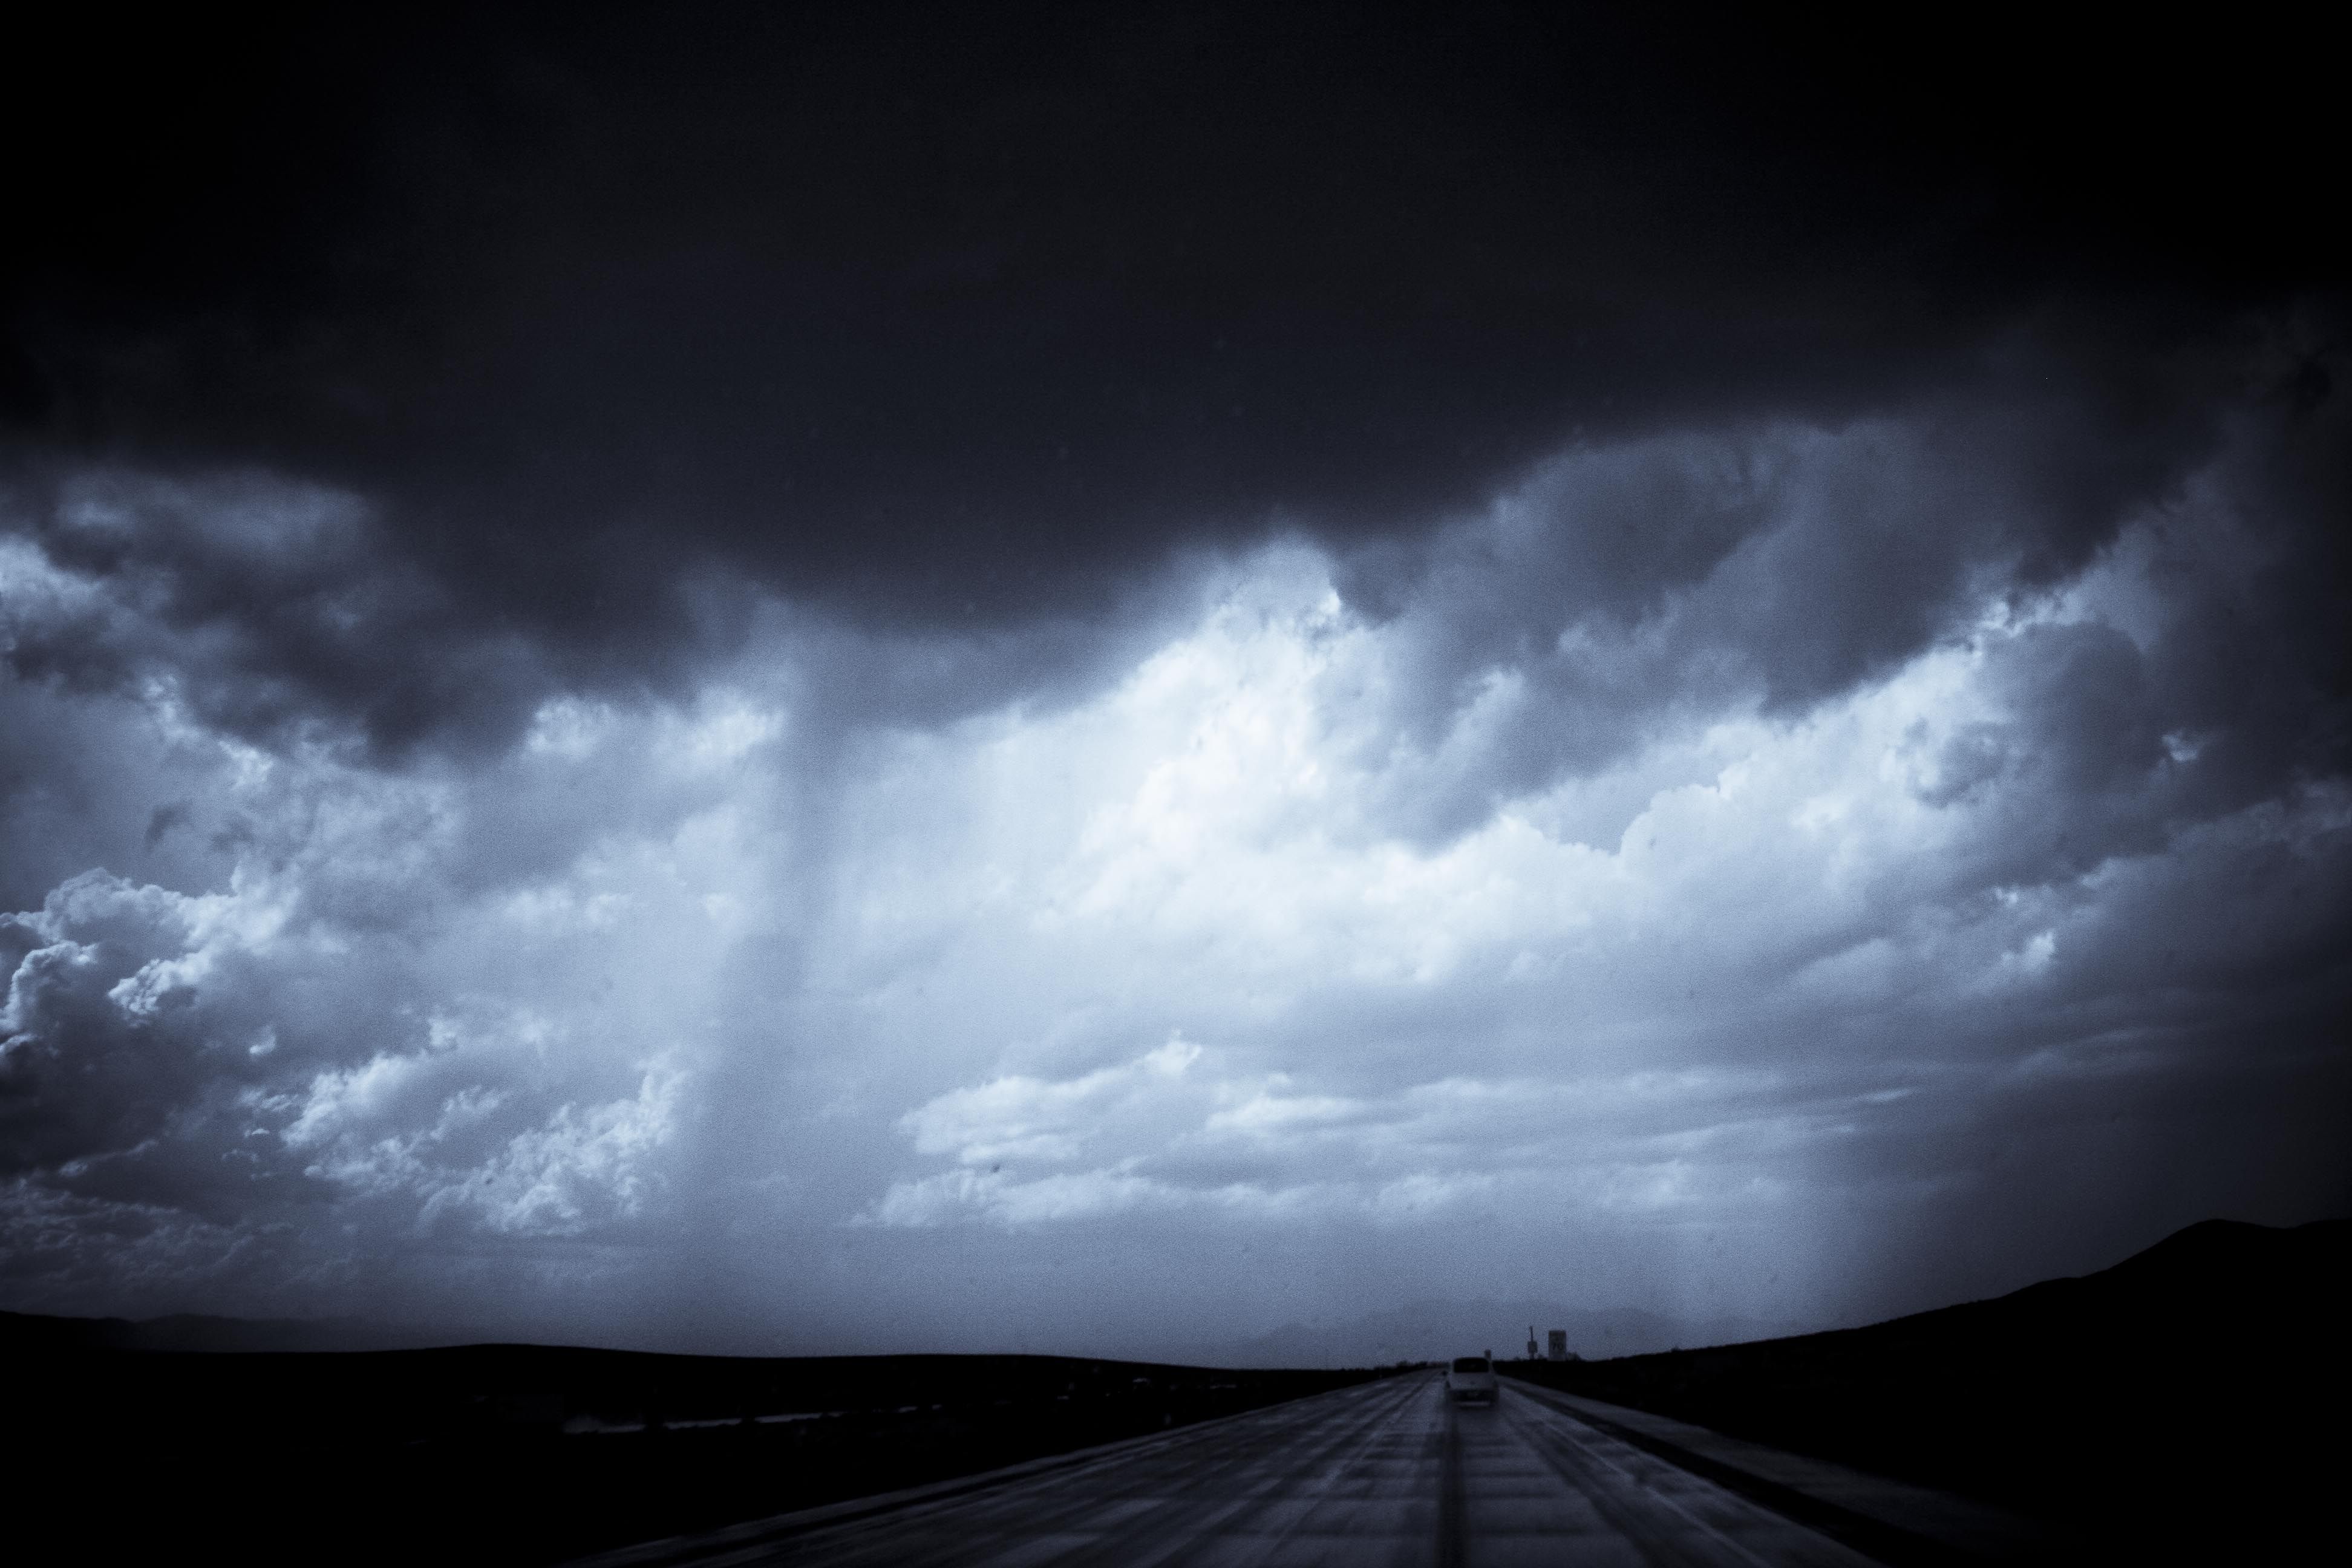 storm season mojave rainstorm mojave rainstorm